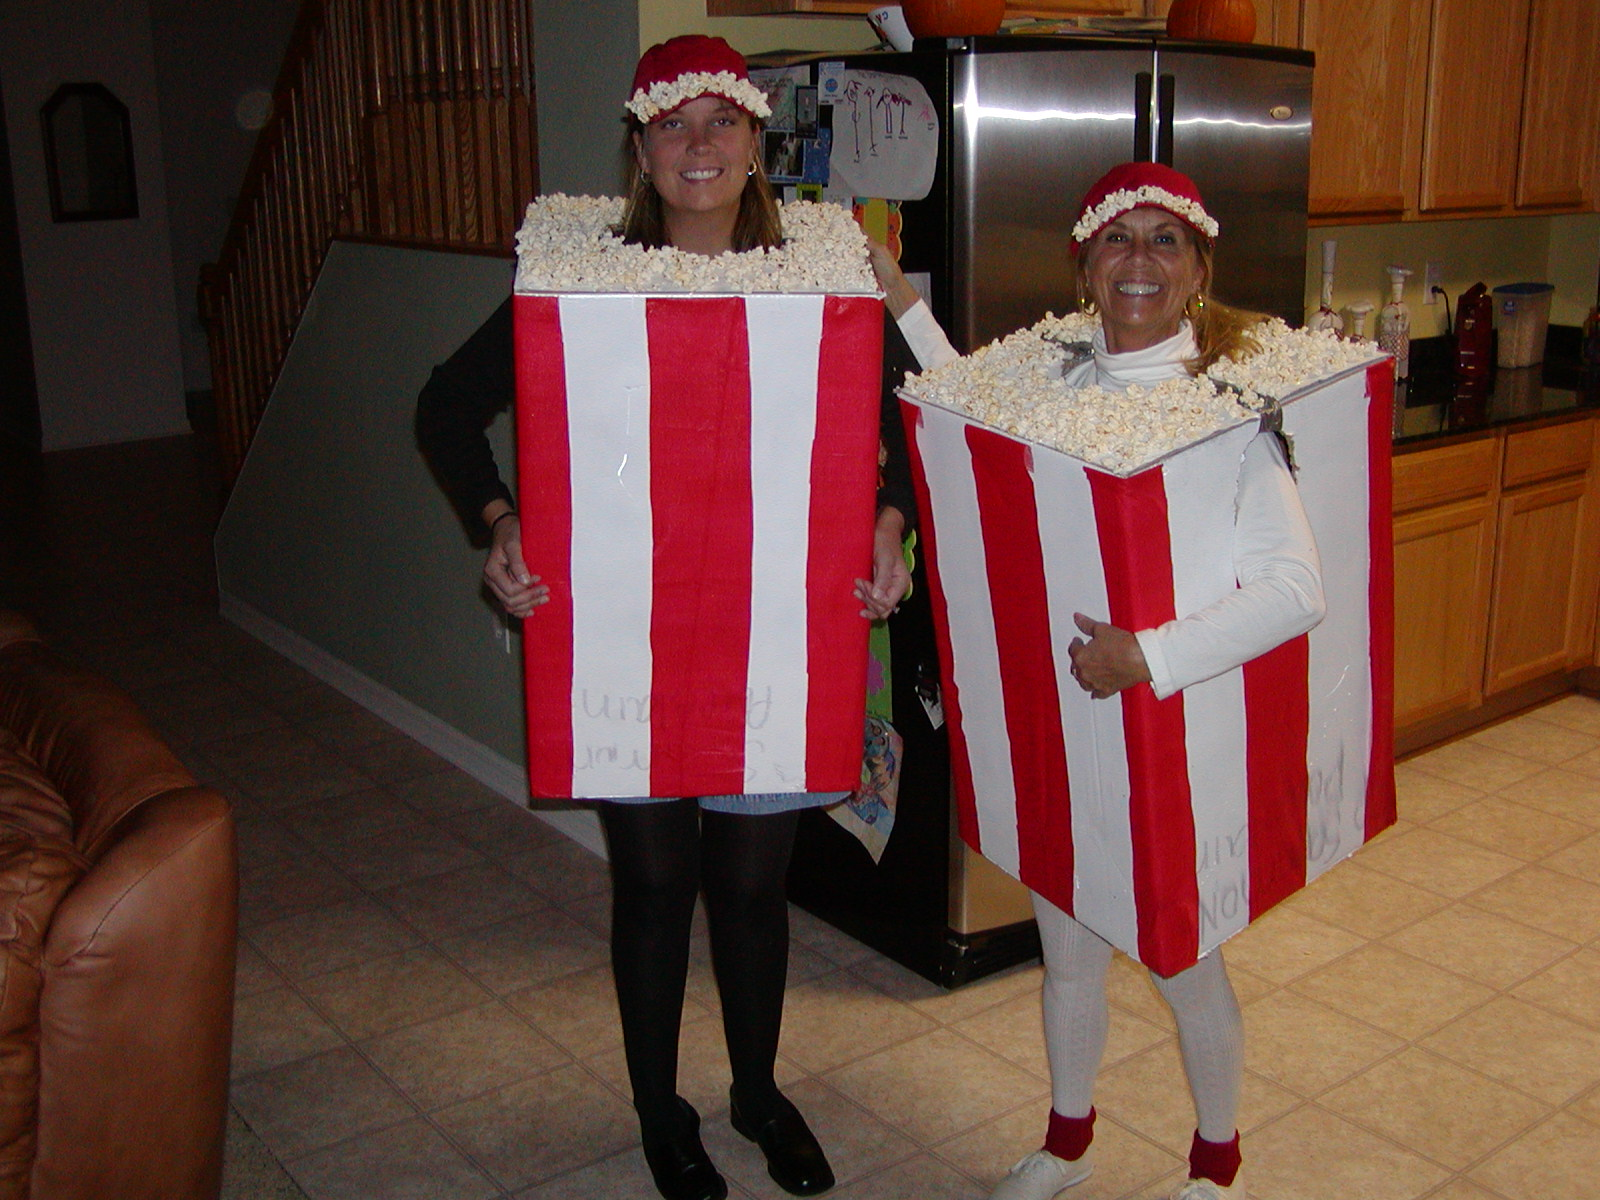 boxes of popcorn costume & costume ideas | Everyday Savings